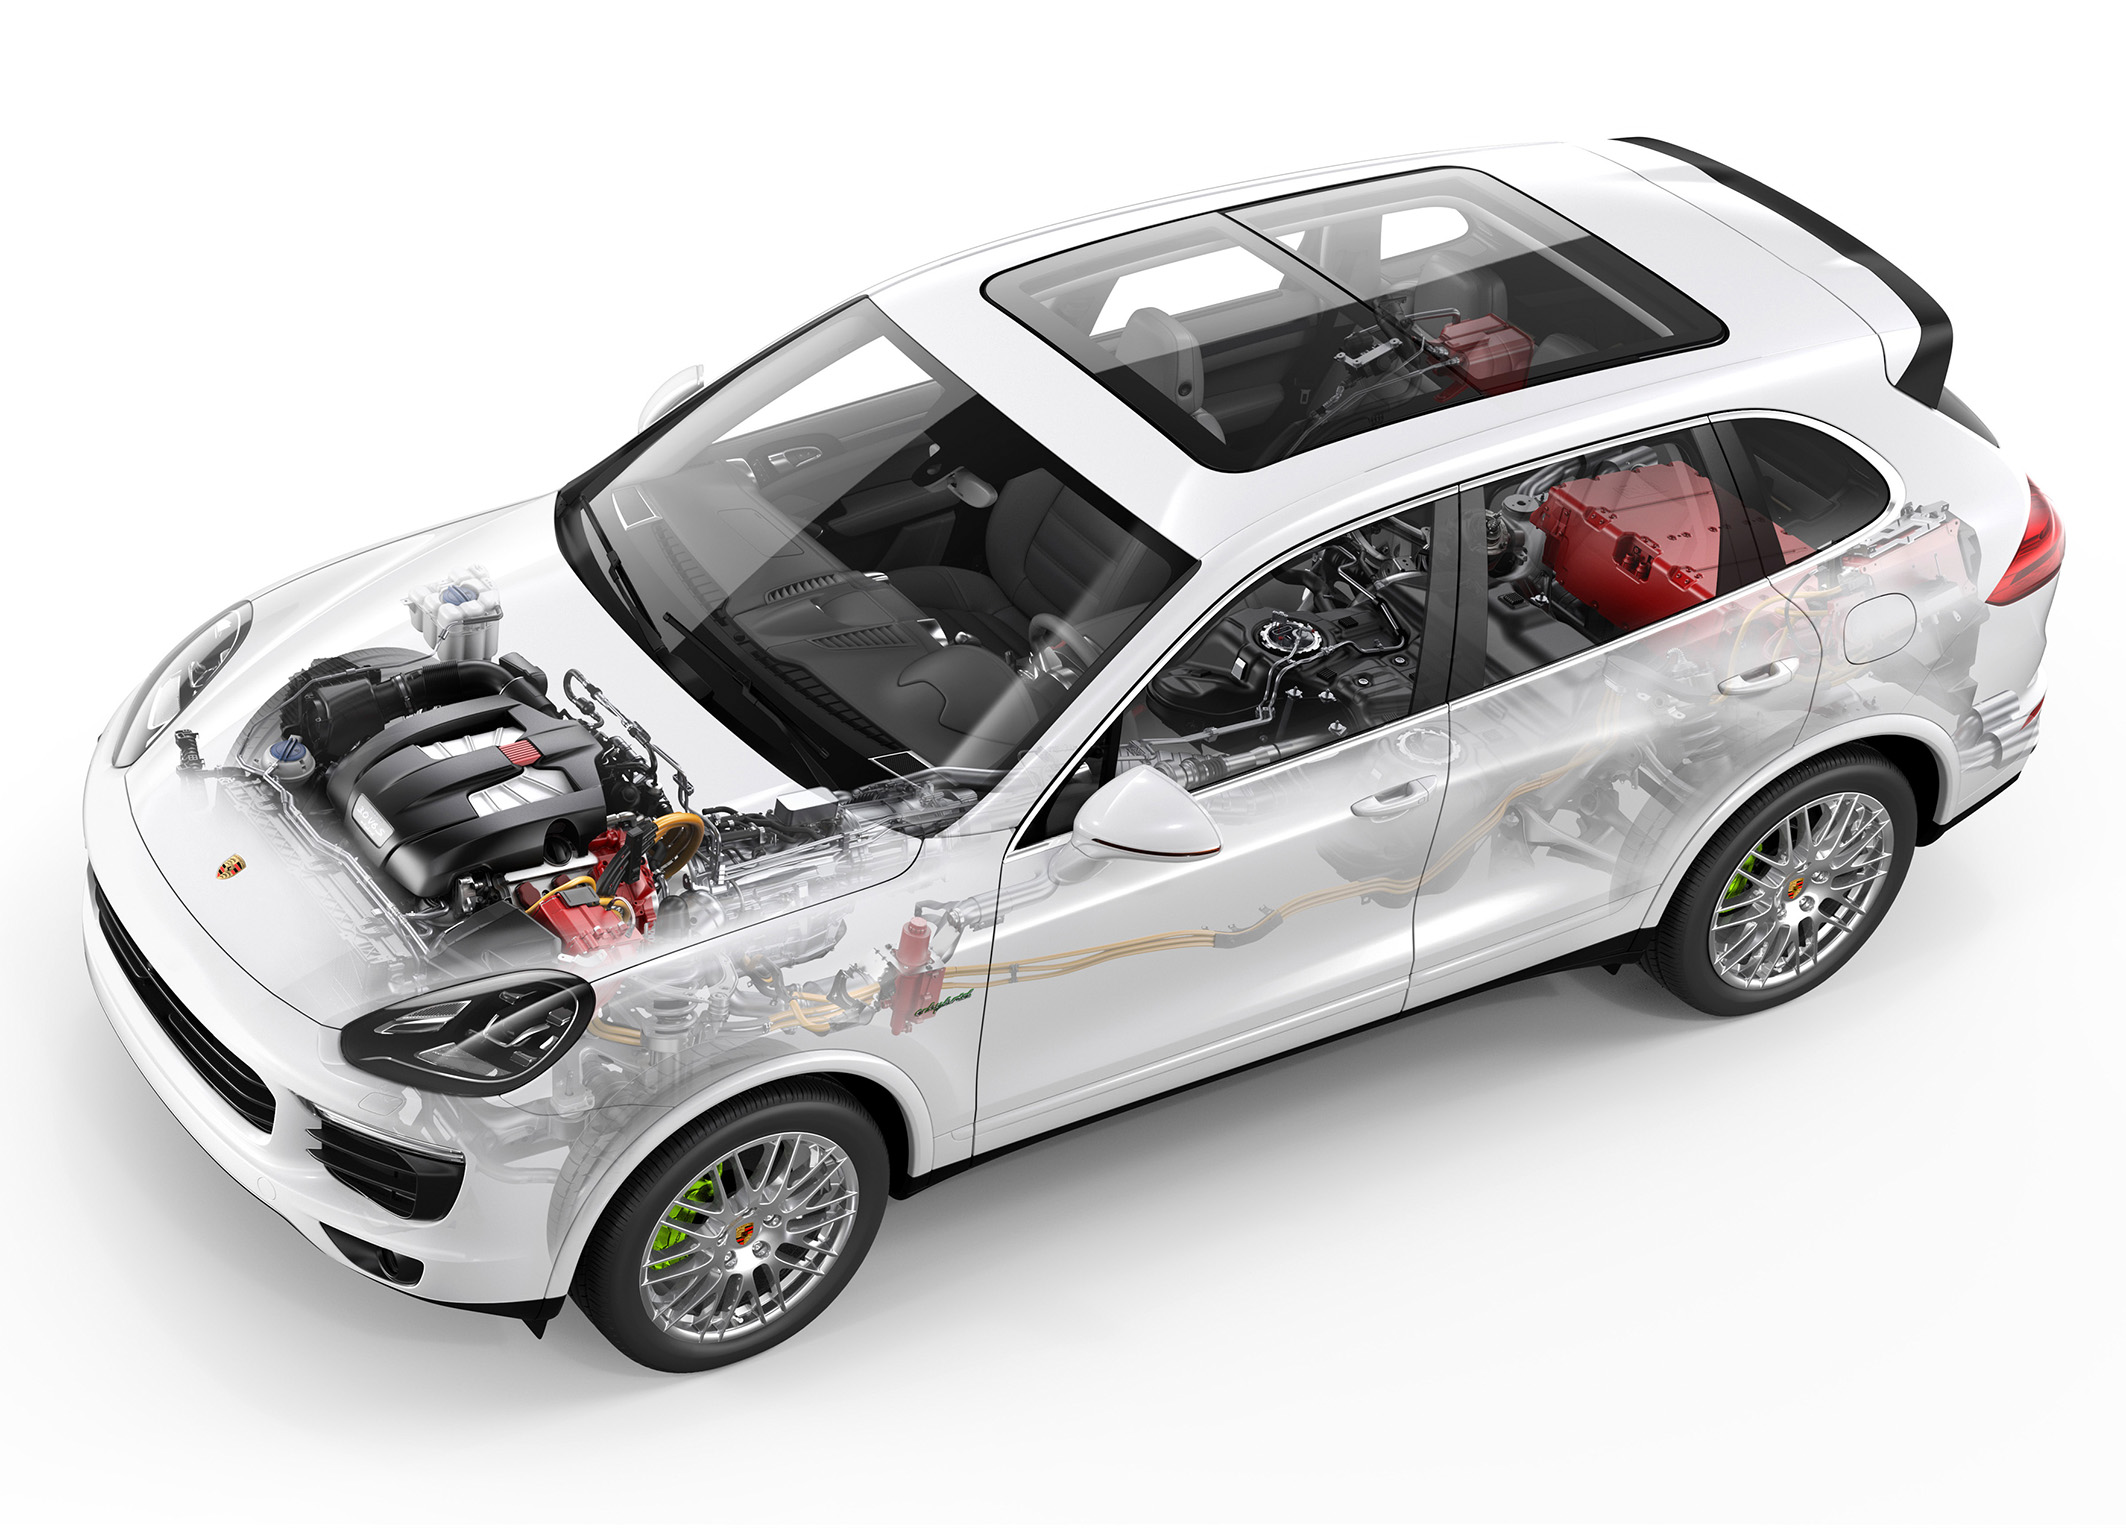 Porsche Cayenne S E-Hybrid Phantom graphic